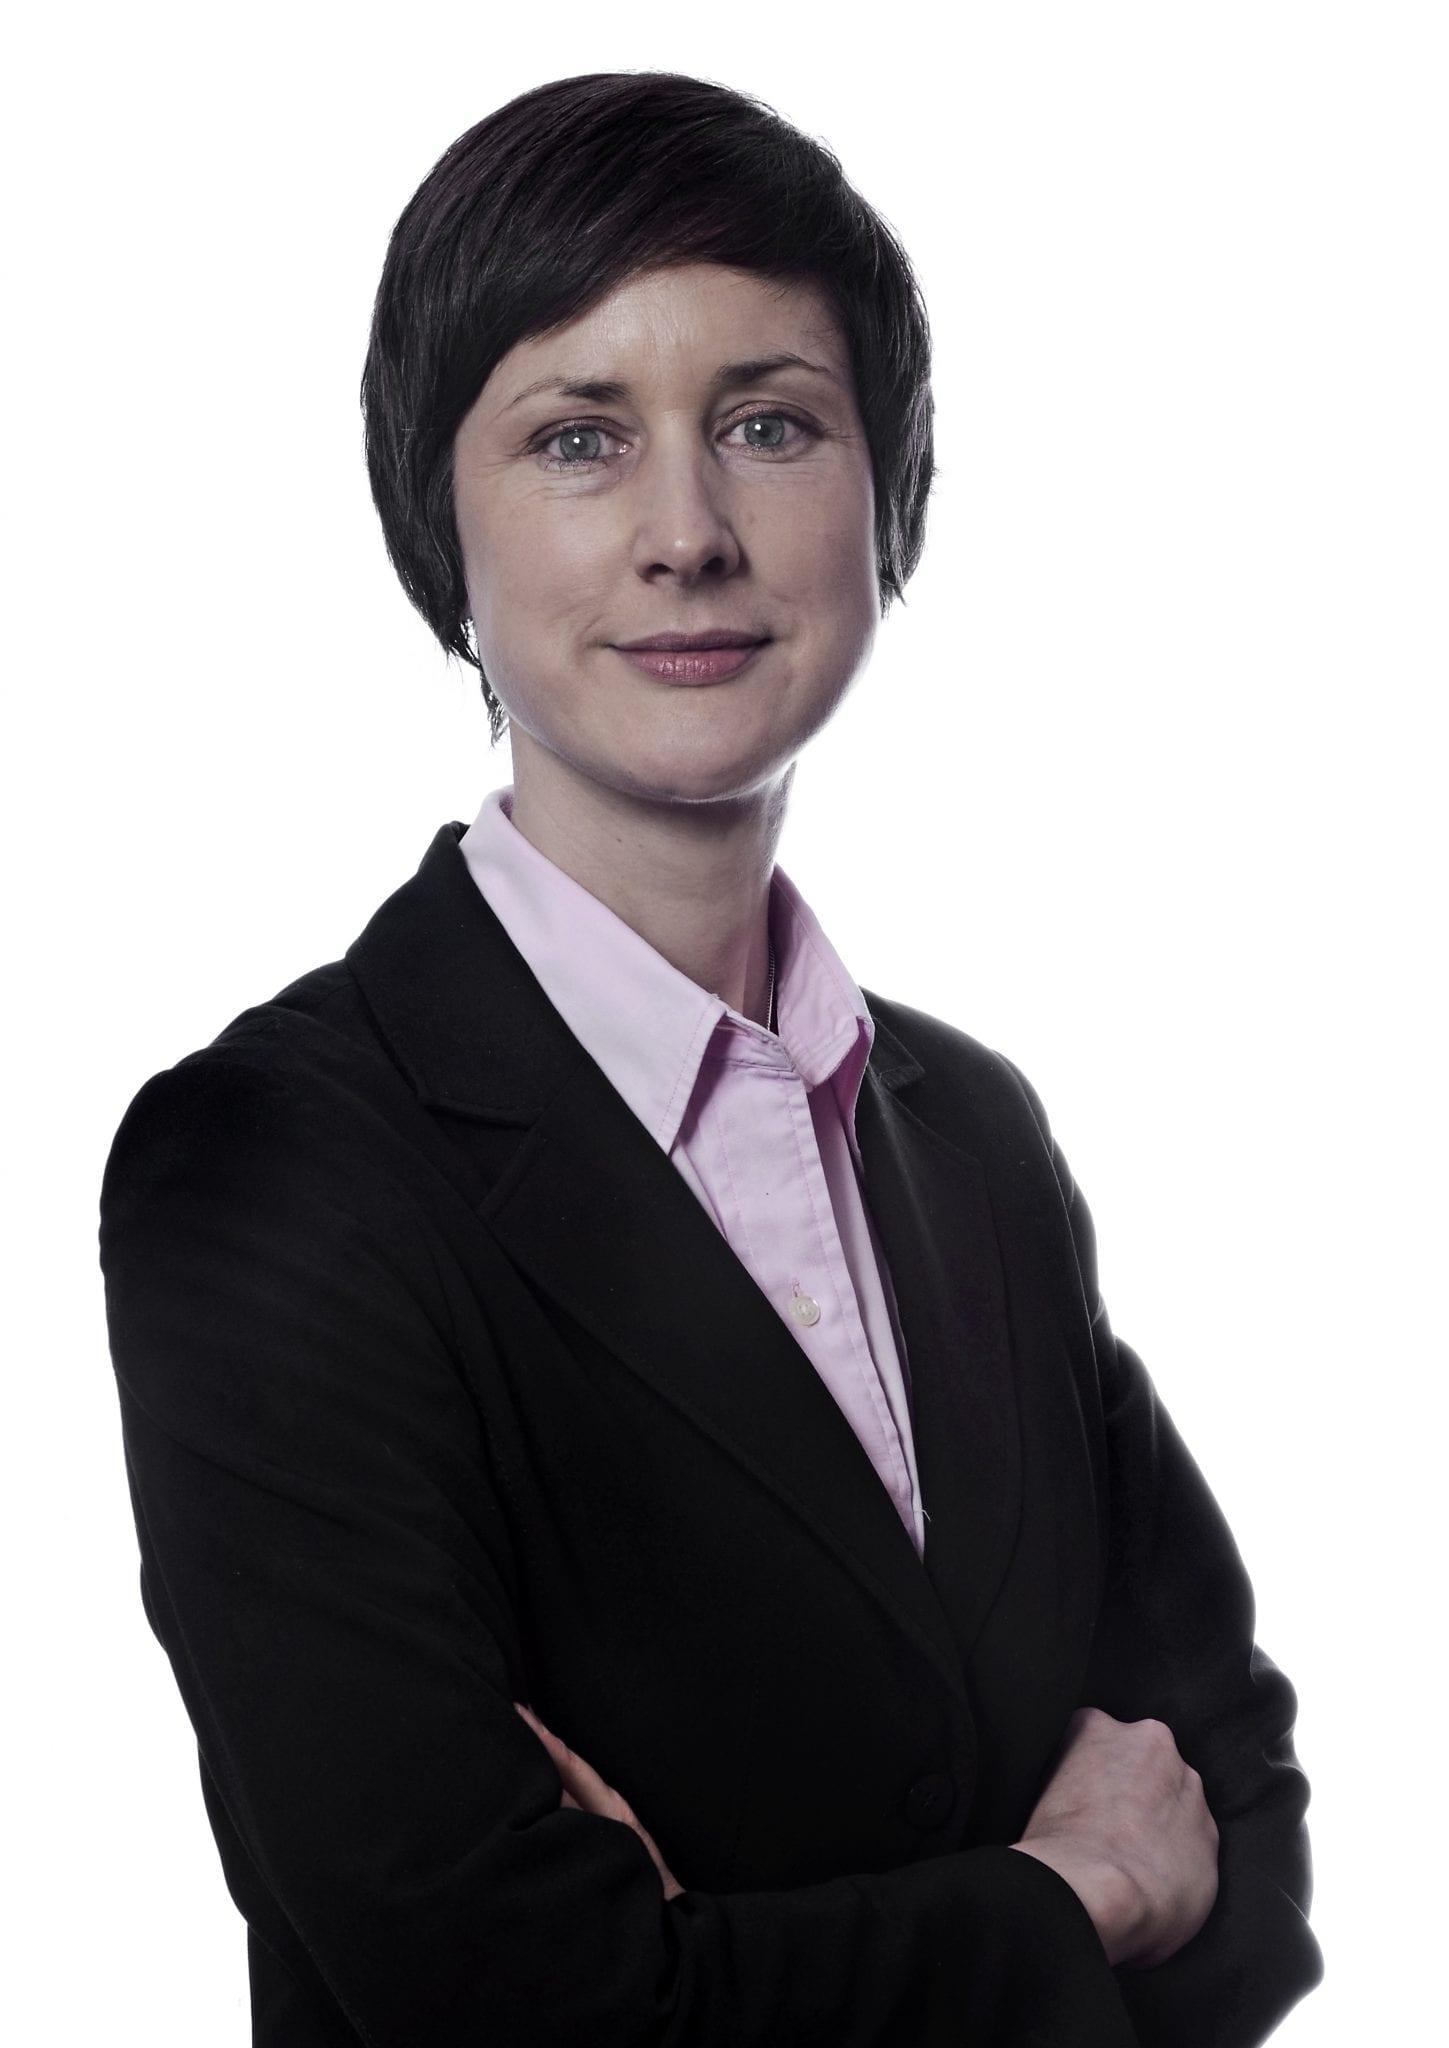 Naomi Candlin